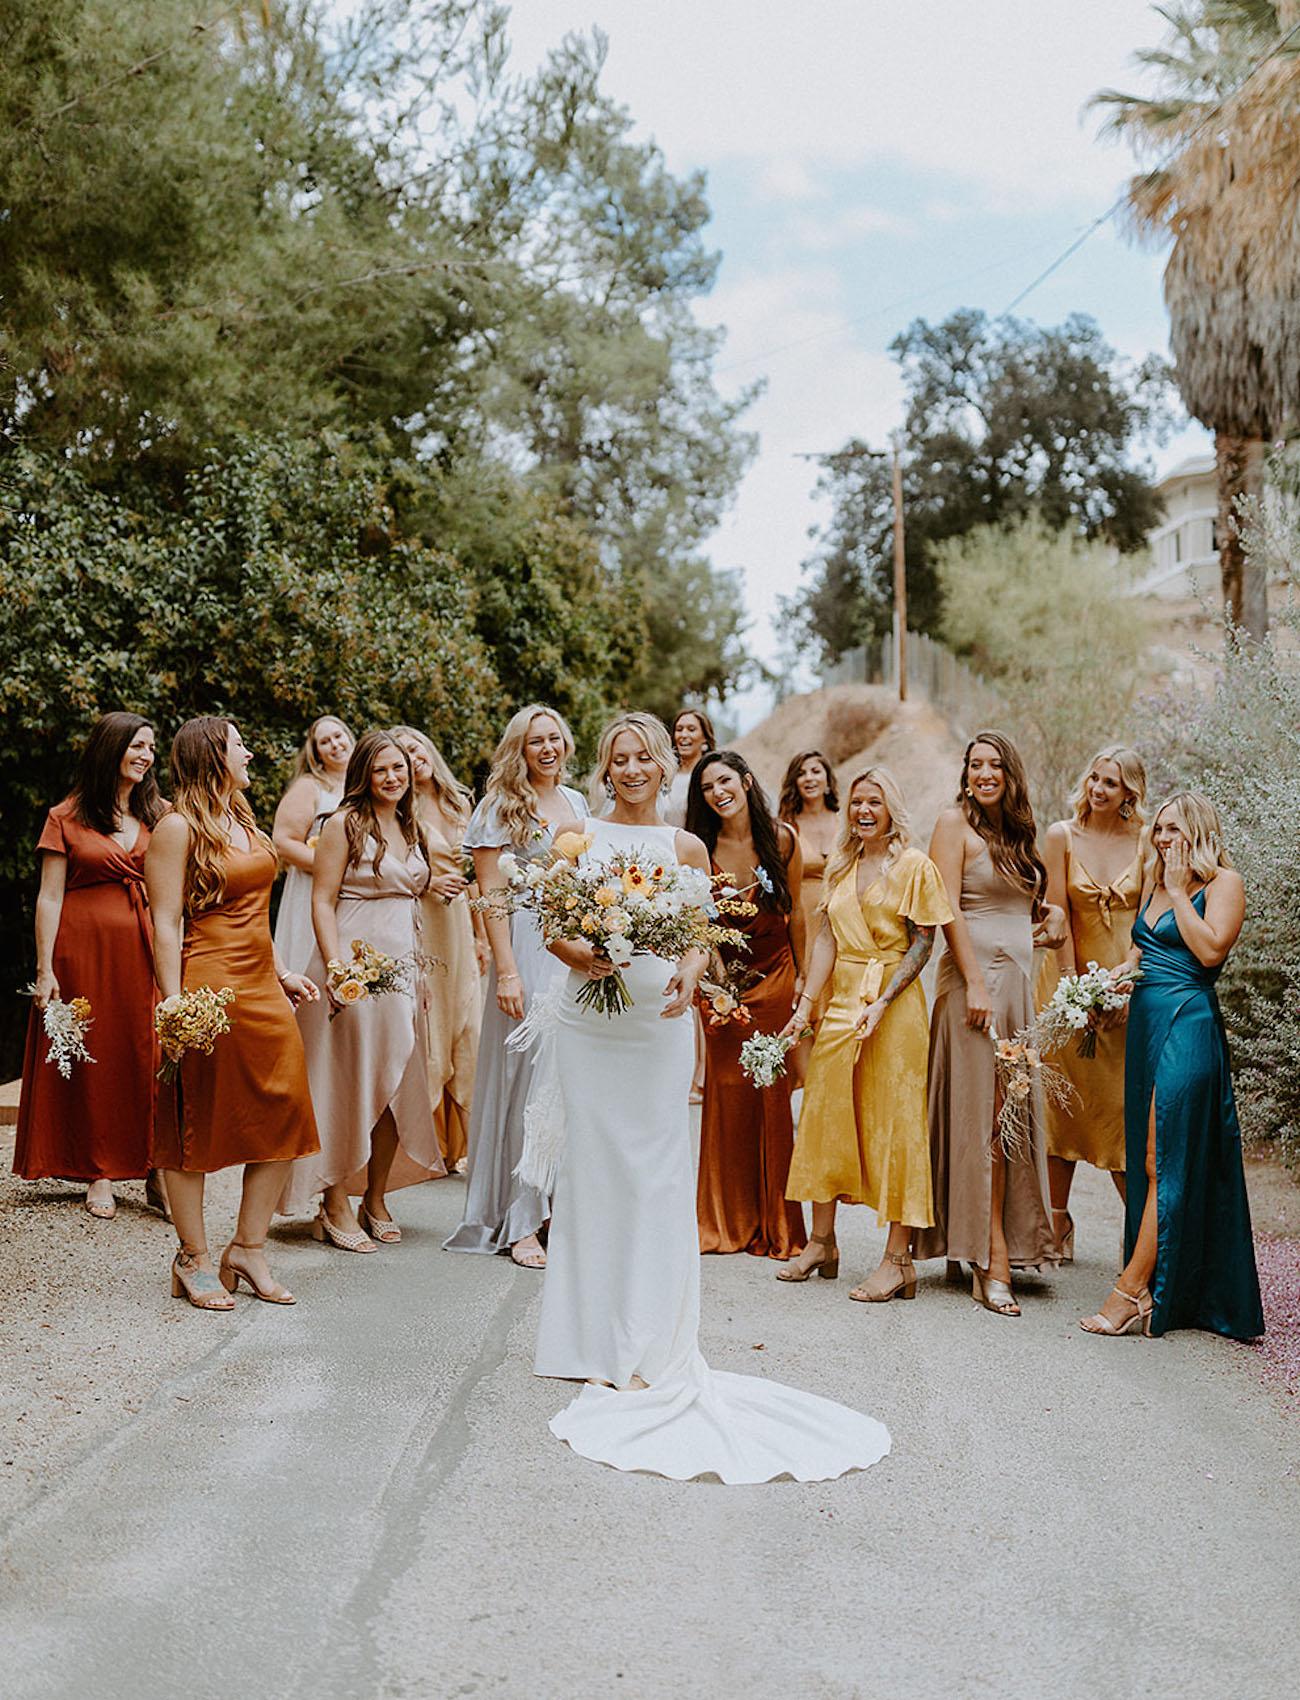 Fall bridesmaids mix and match colors